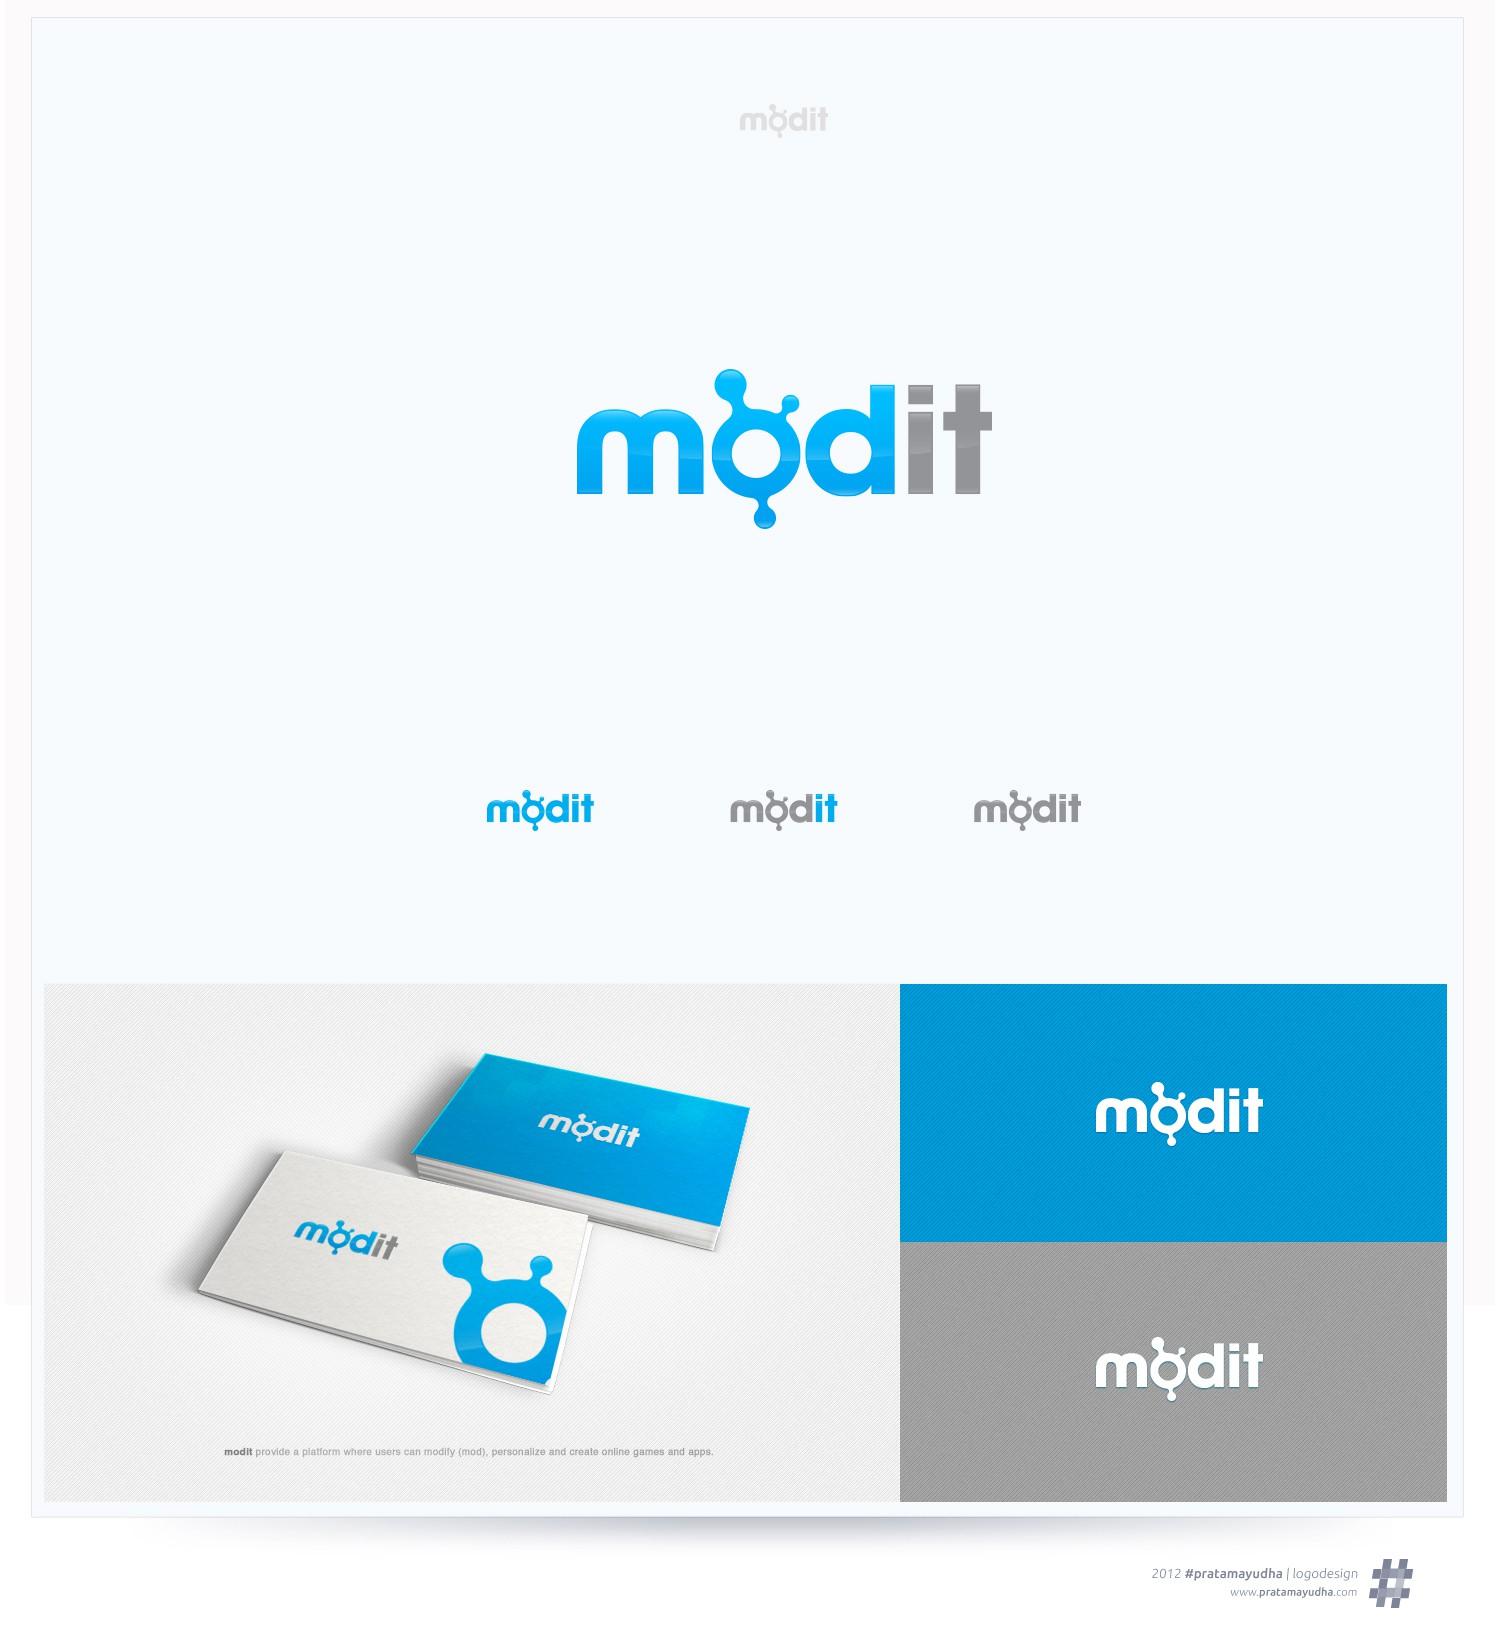 Modit needs a new logo